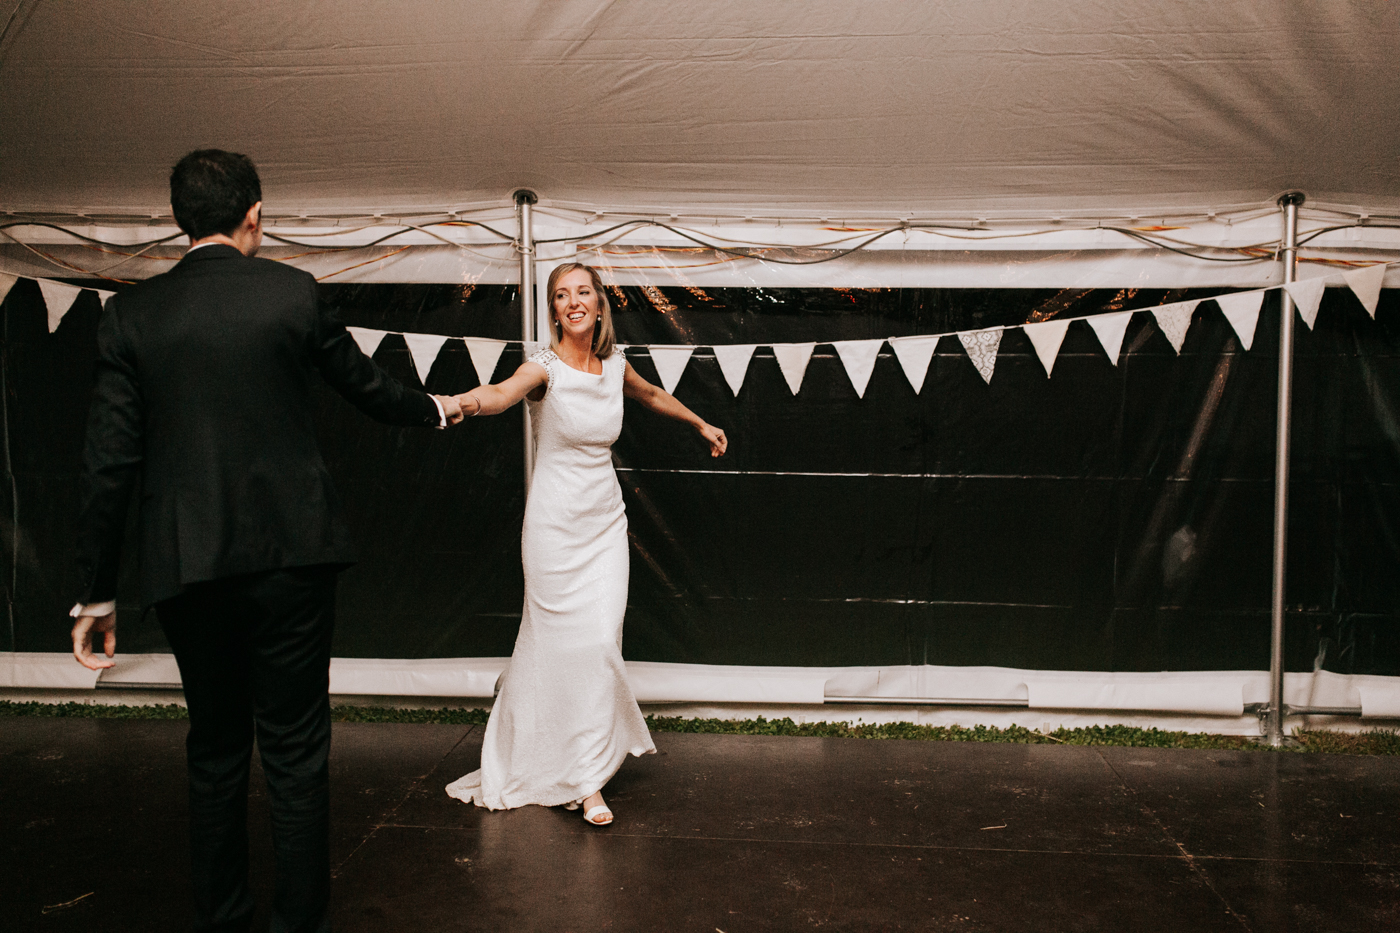 Bridget & James - Orange Country Wedding - Samantha Heather Photography-269.jpg